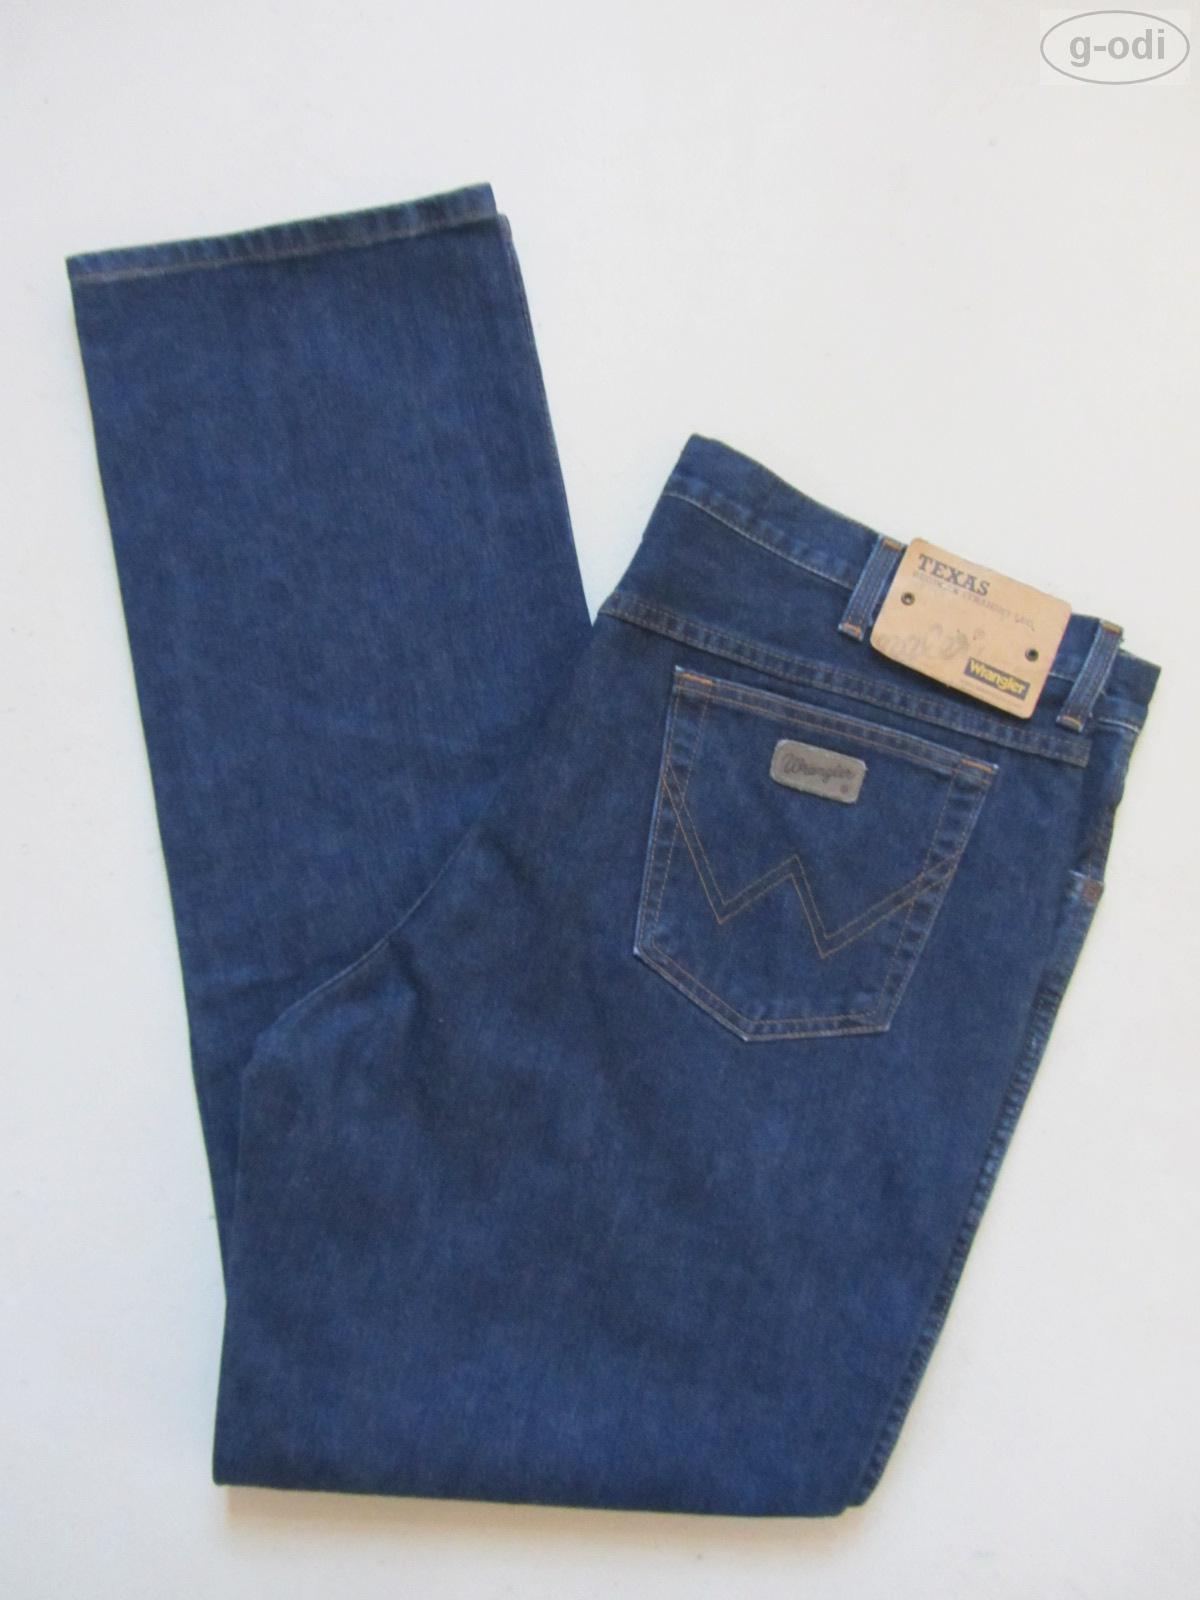 Wrangler TEXAS Jeans Hose W 42  L 34, NEU   Darkstone Washed Denim, RAR   Gr. 58